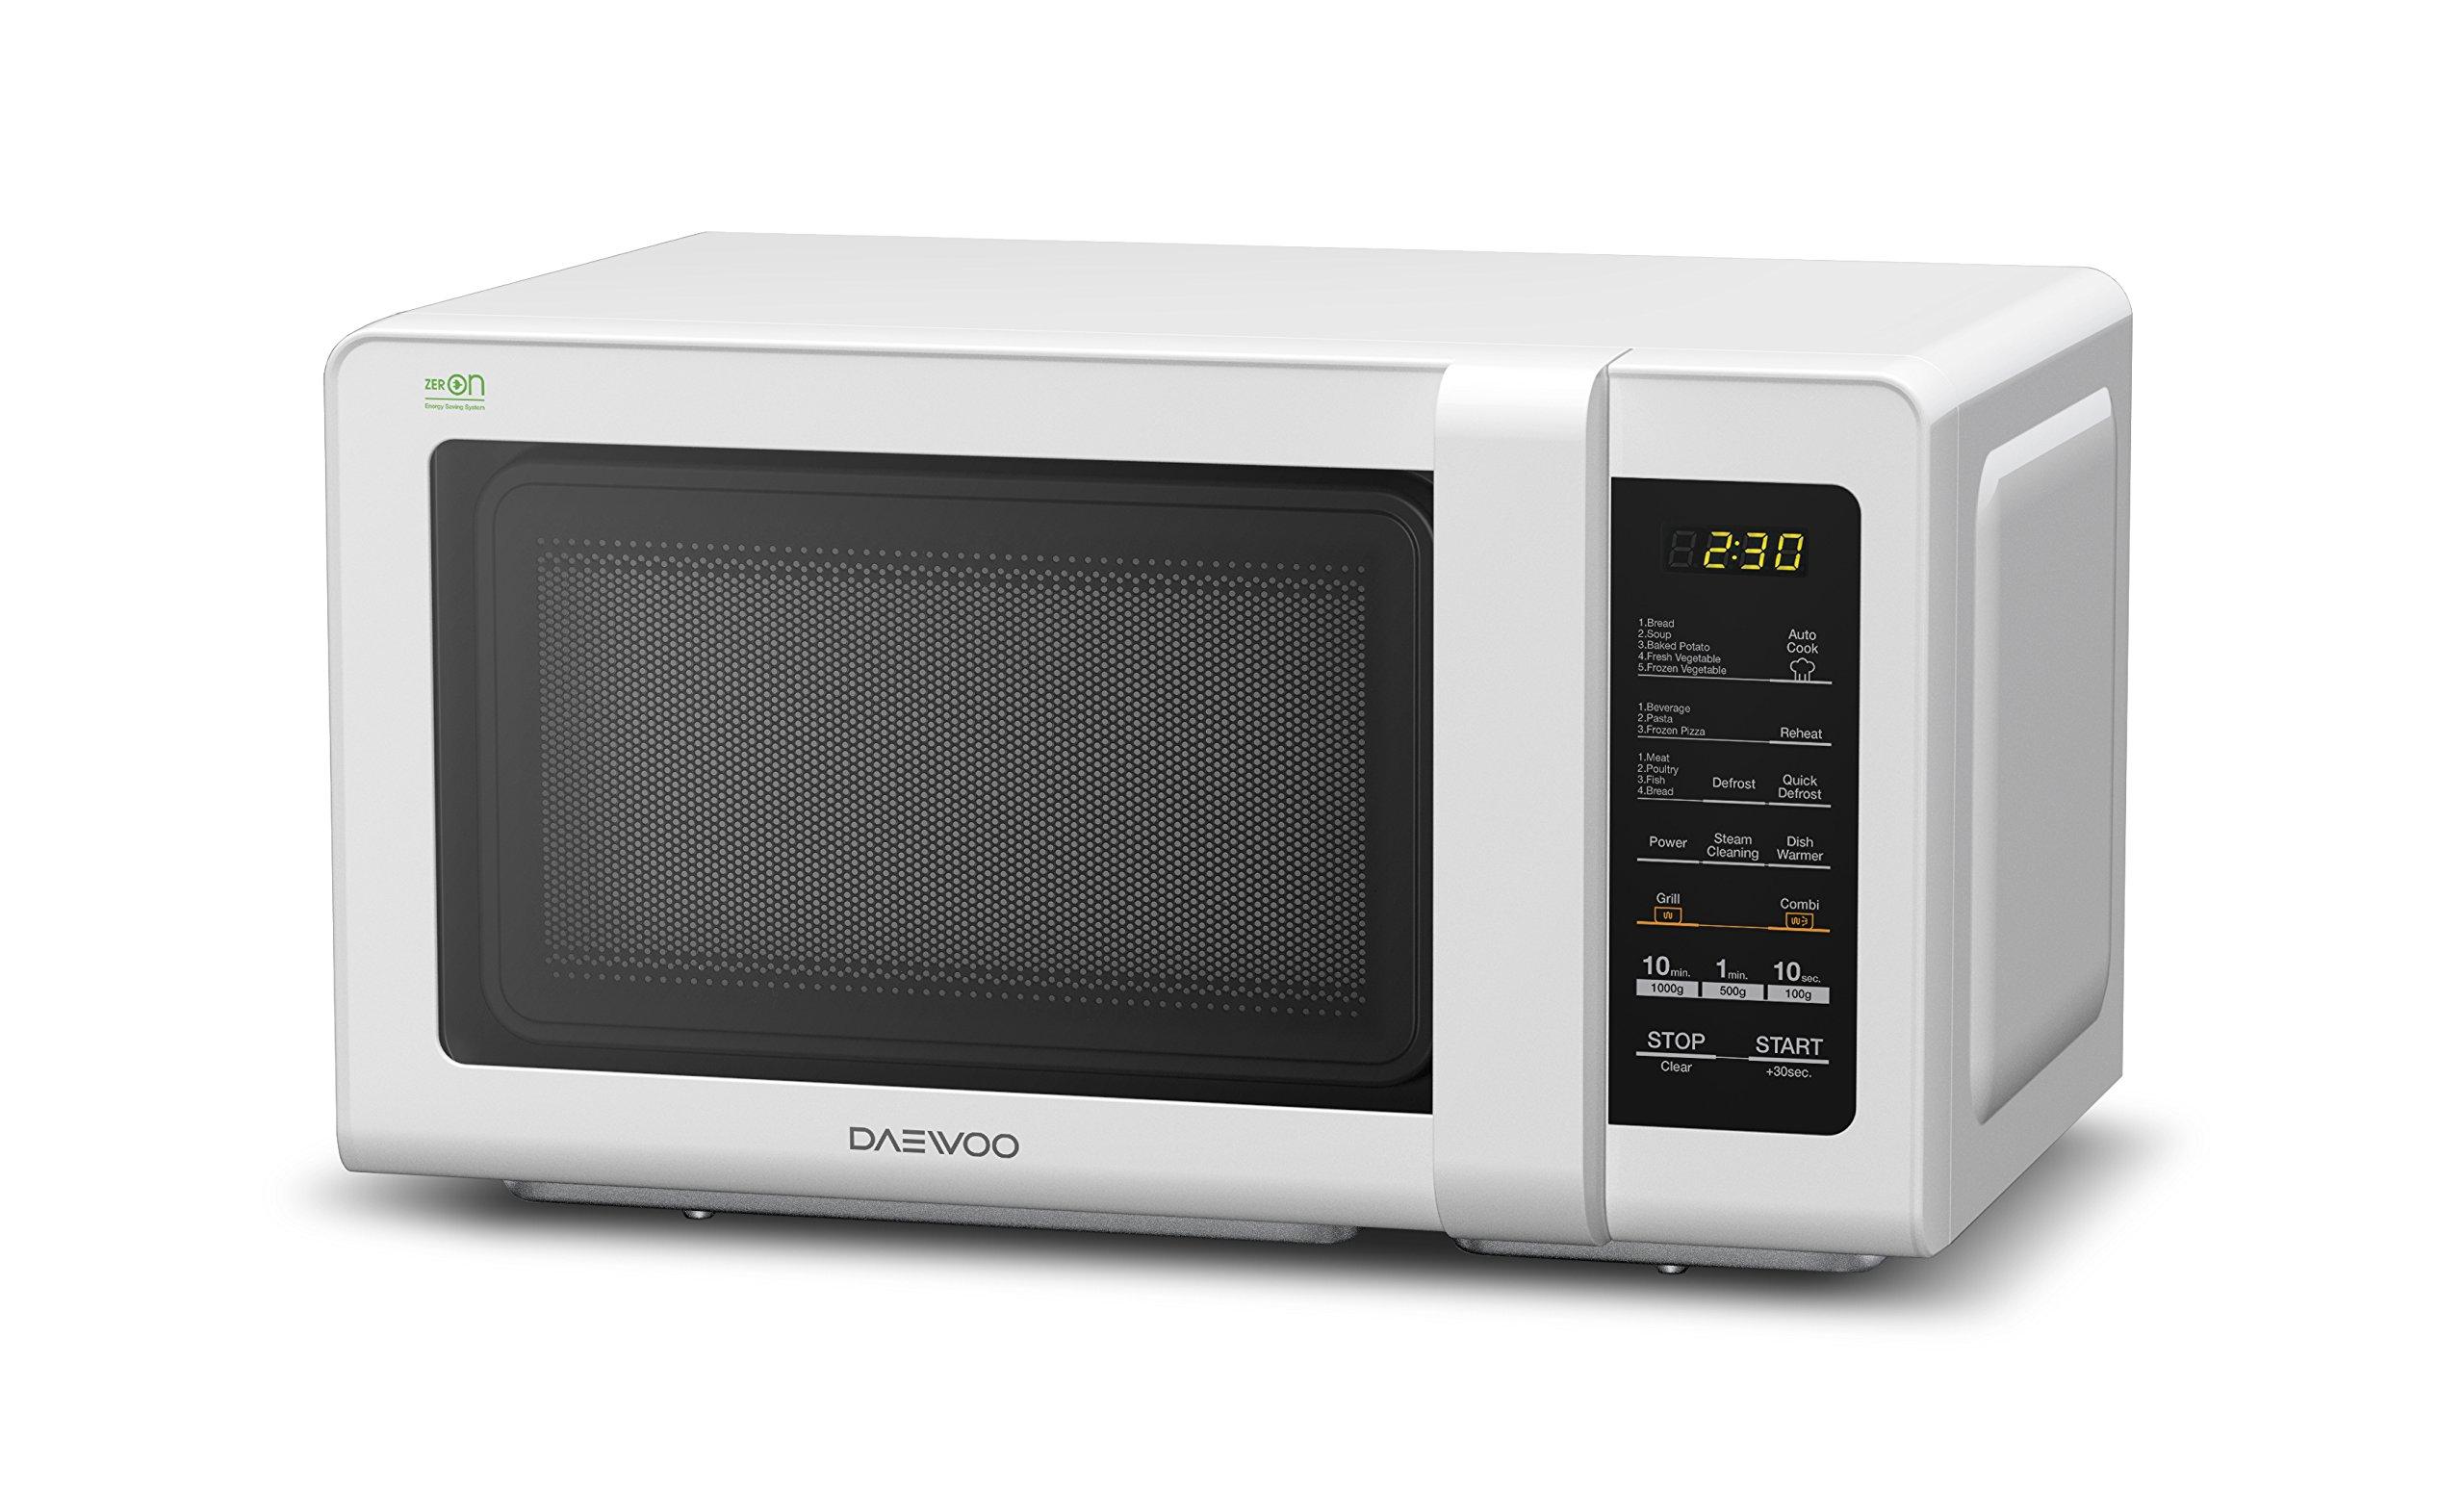 Daewoo KOG-6F2B Microondas, 20 litros, Digital, con Grill, Color Blanco product image